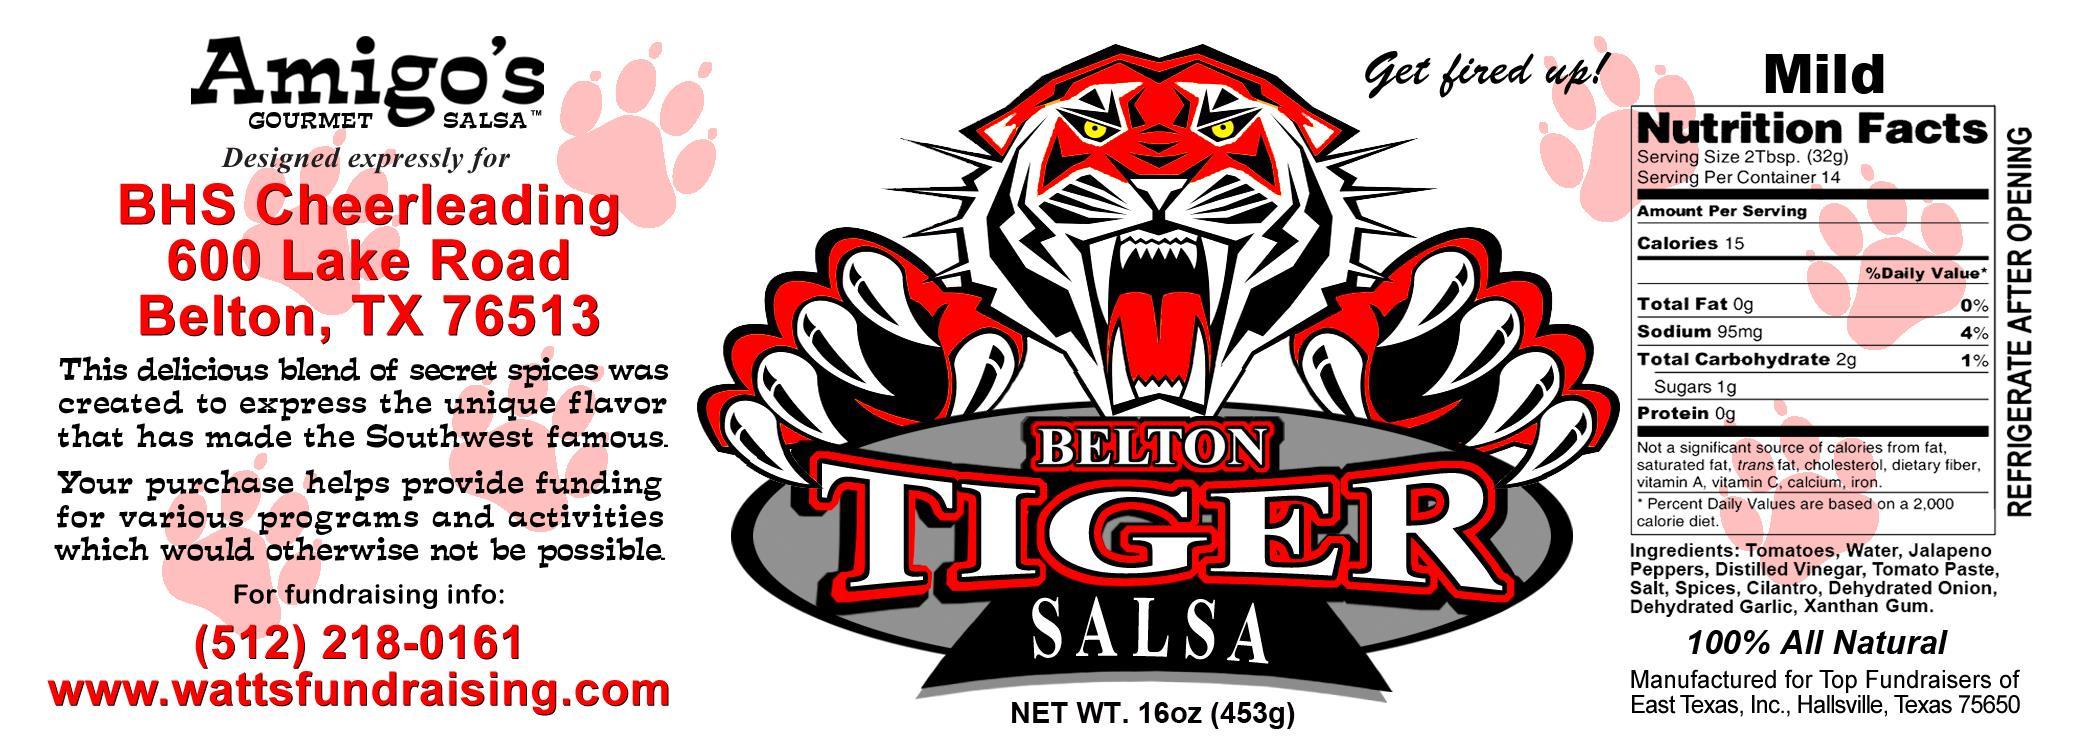 Belton High School Fundraiser Jar Label MILD.jpg